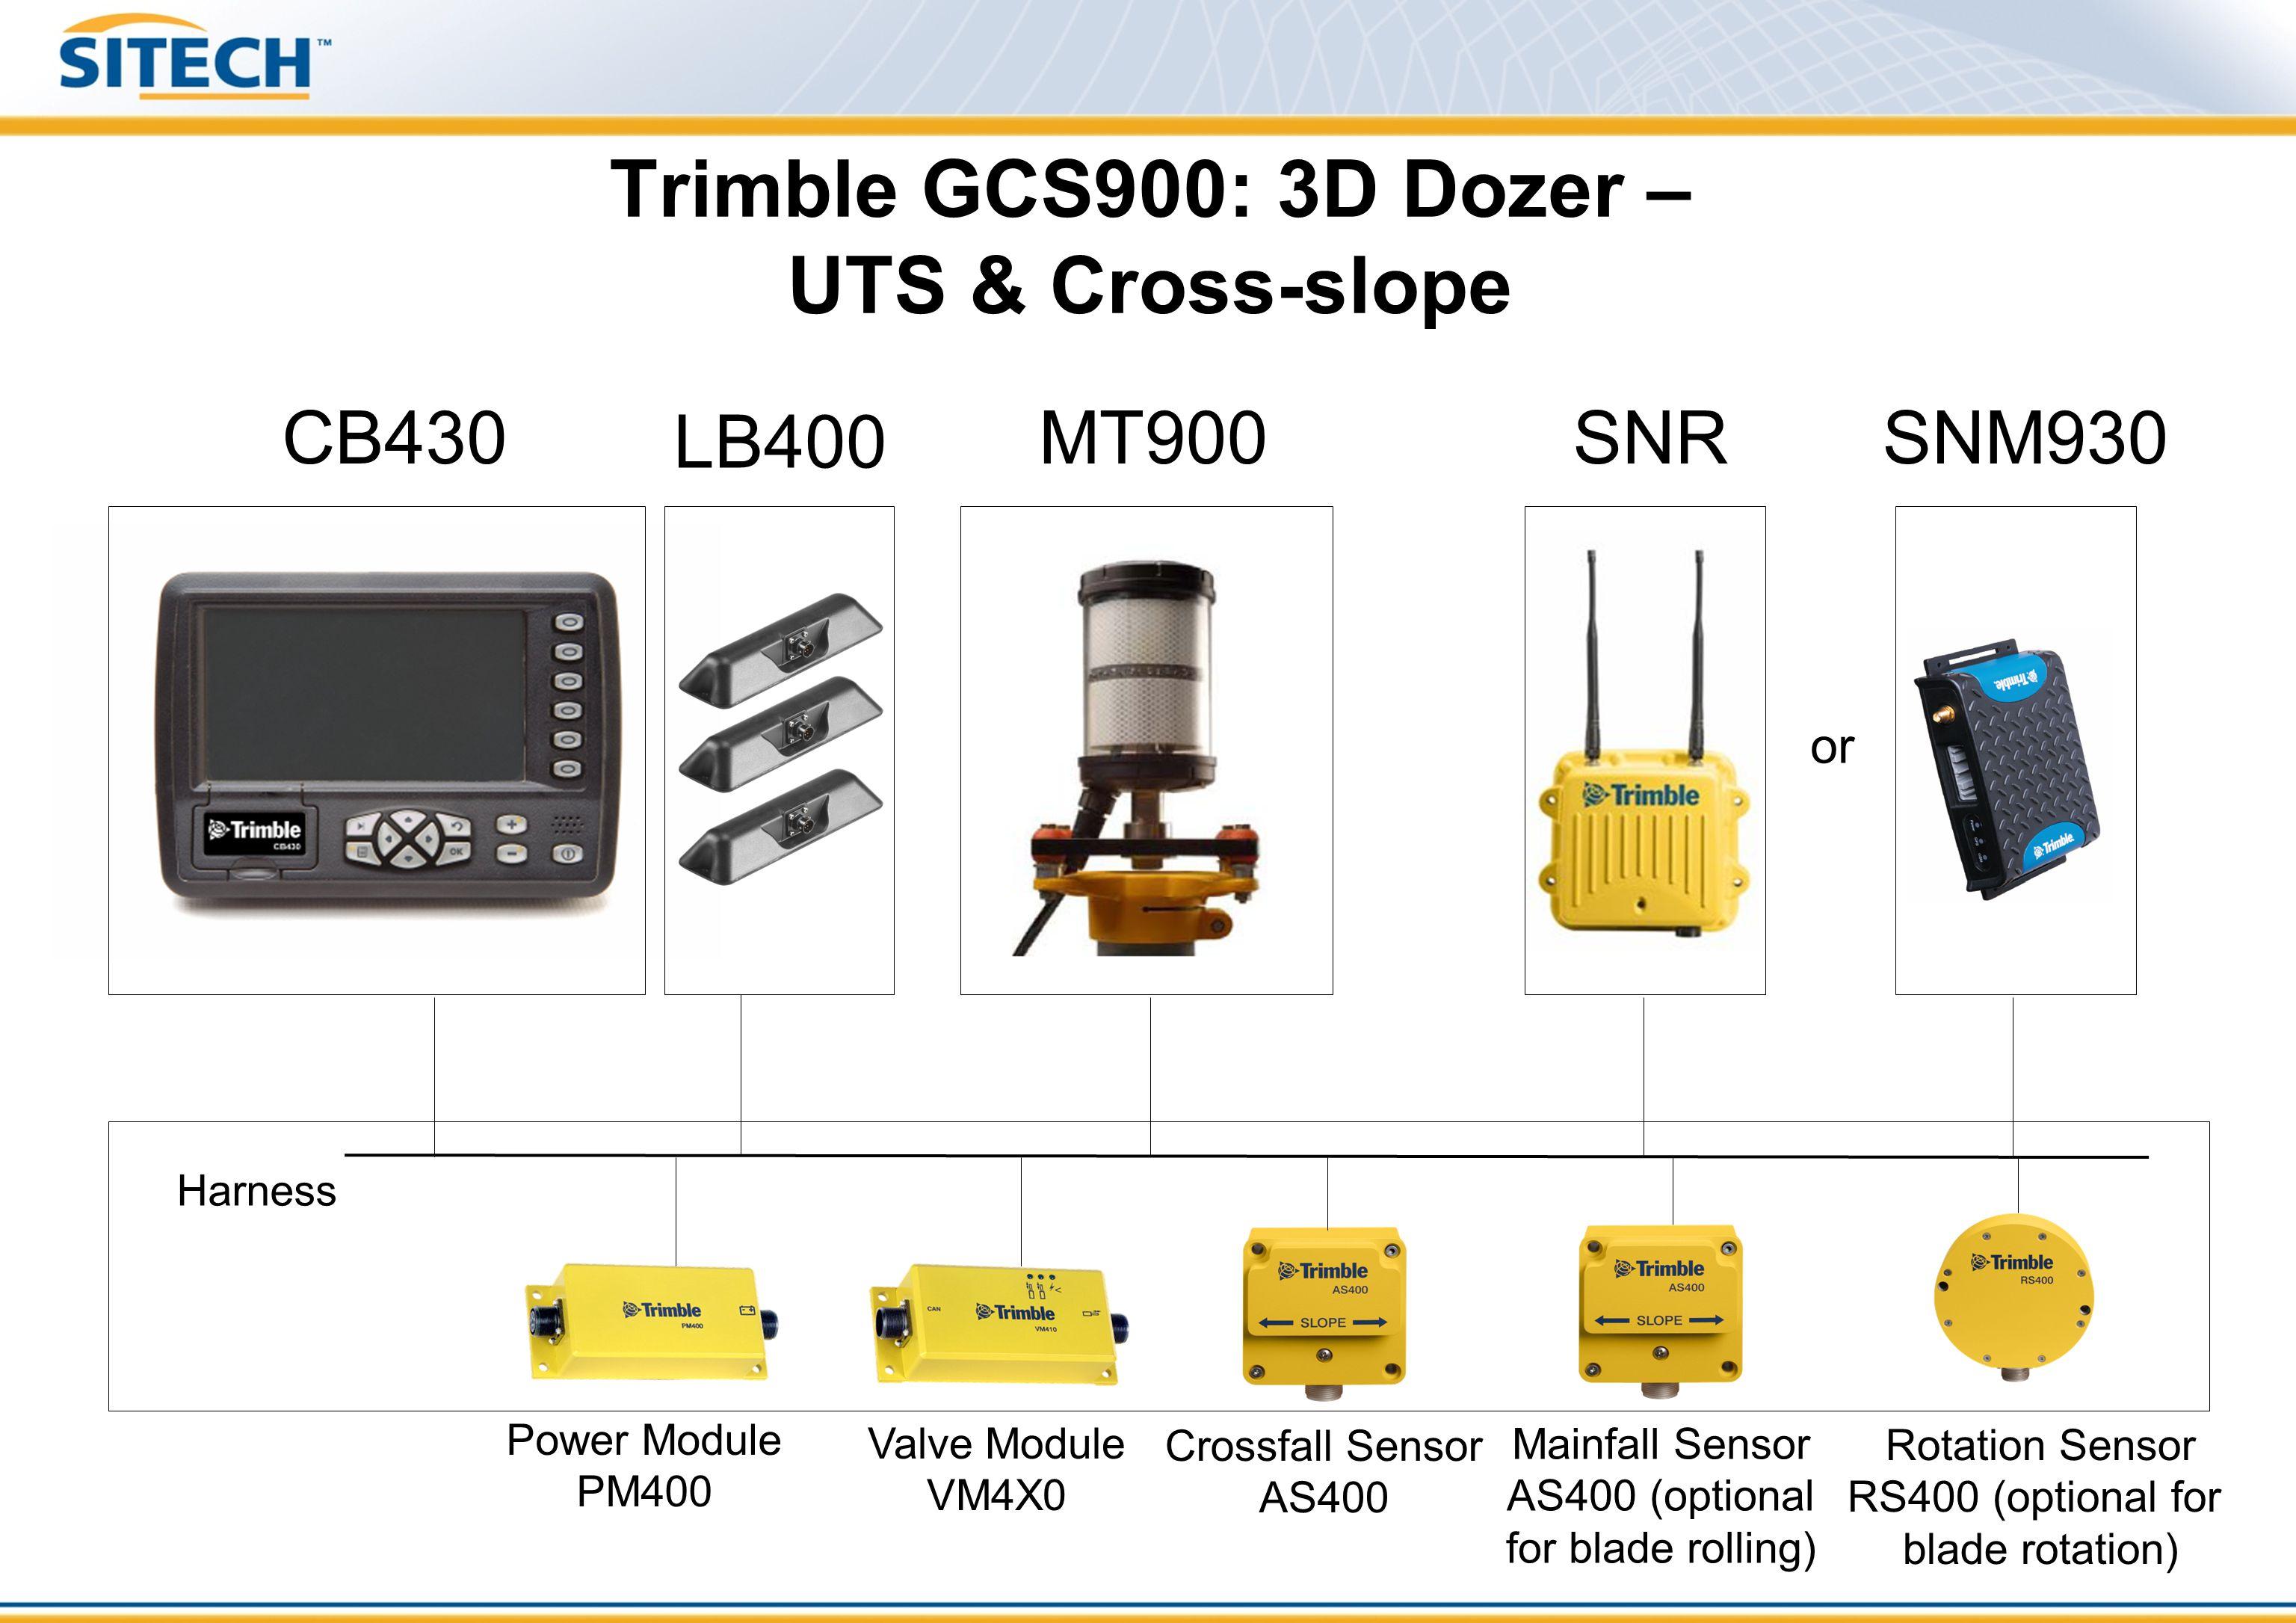 Trimble GCS900: 3D Dozer – UTS & Cross-slope